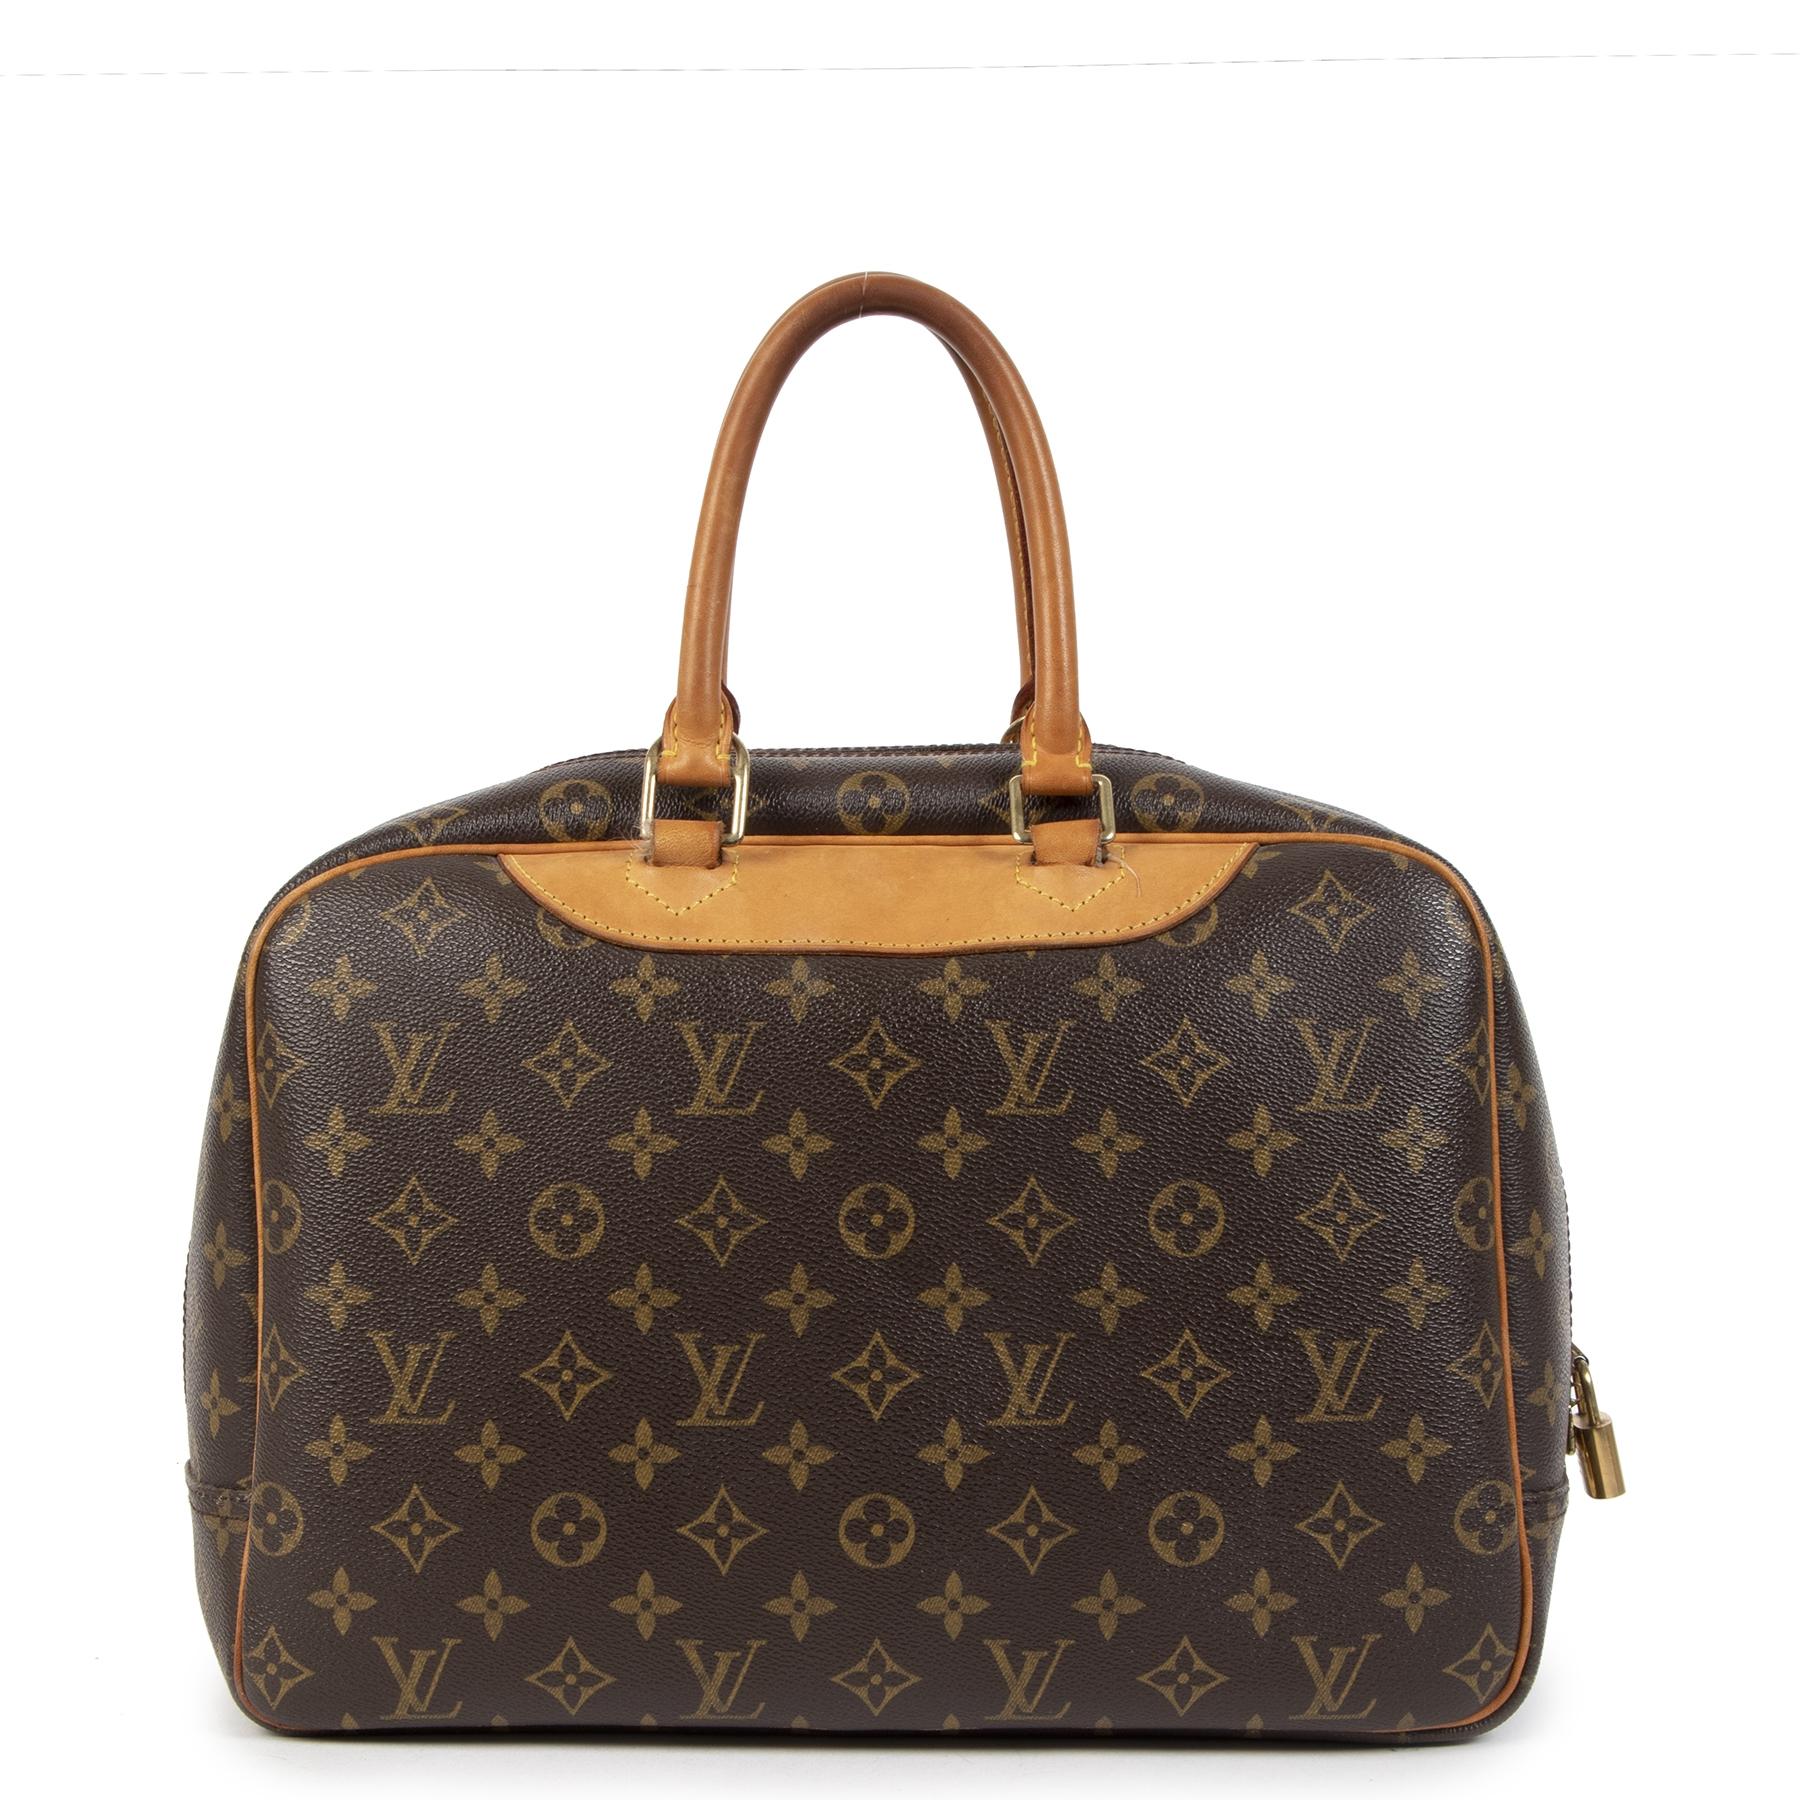 Authentic secondhand Louis Vuitton Trouville Monogram Bag designer bags designer brands fashion luxury vintage webshop safe secure online shopping worldwide shipping